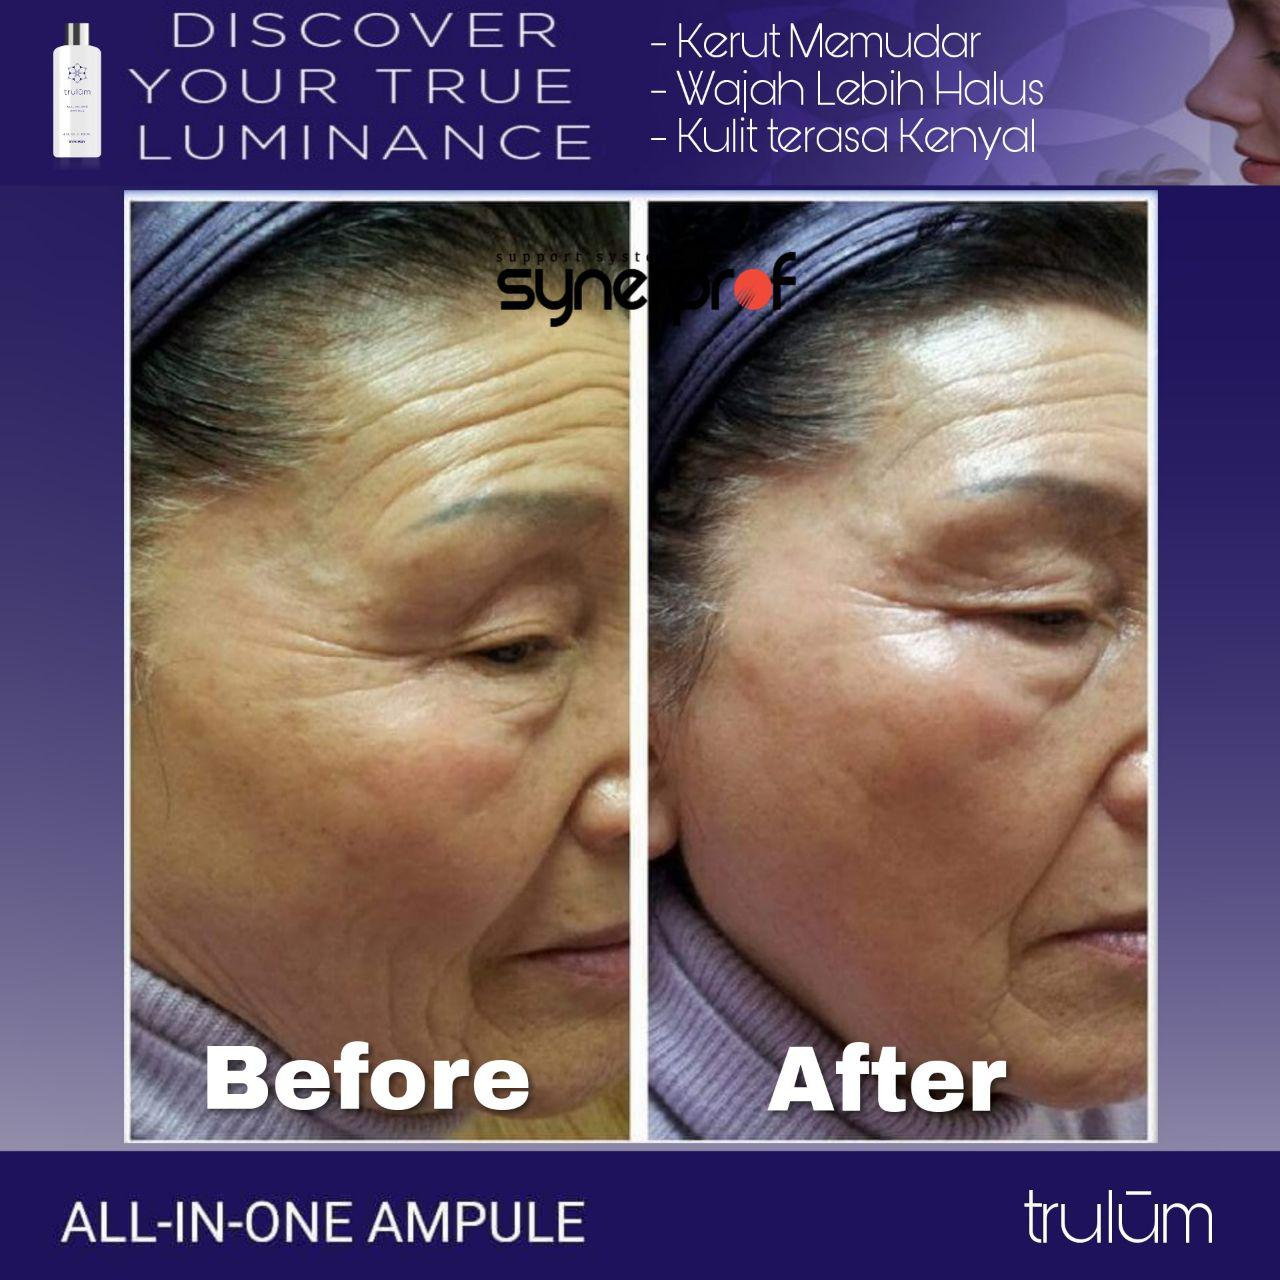 Jual Trulum Skincare Di Mlonggo, Jepara WA: 08112338376